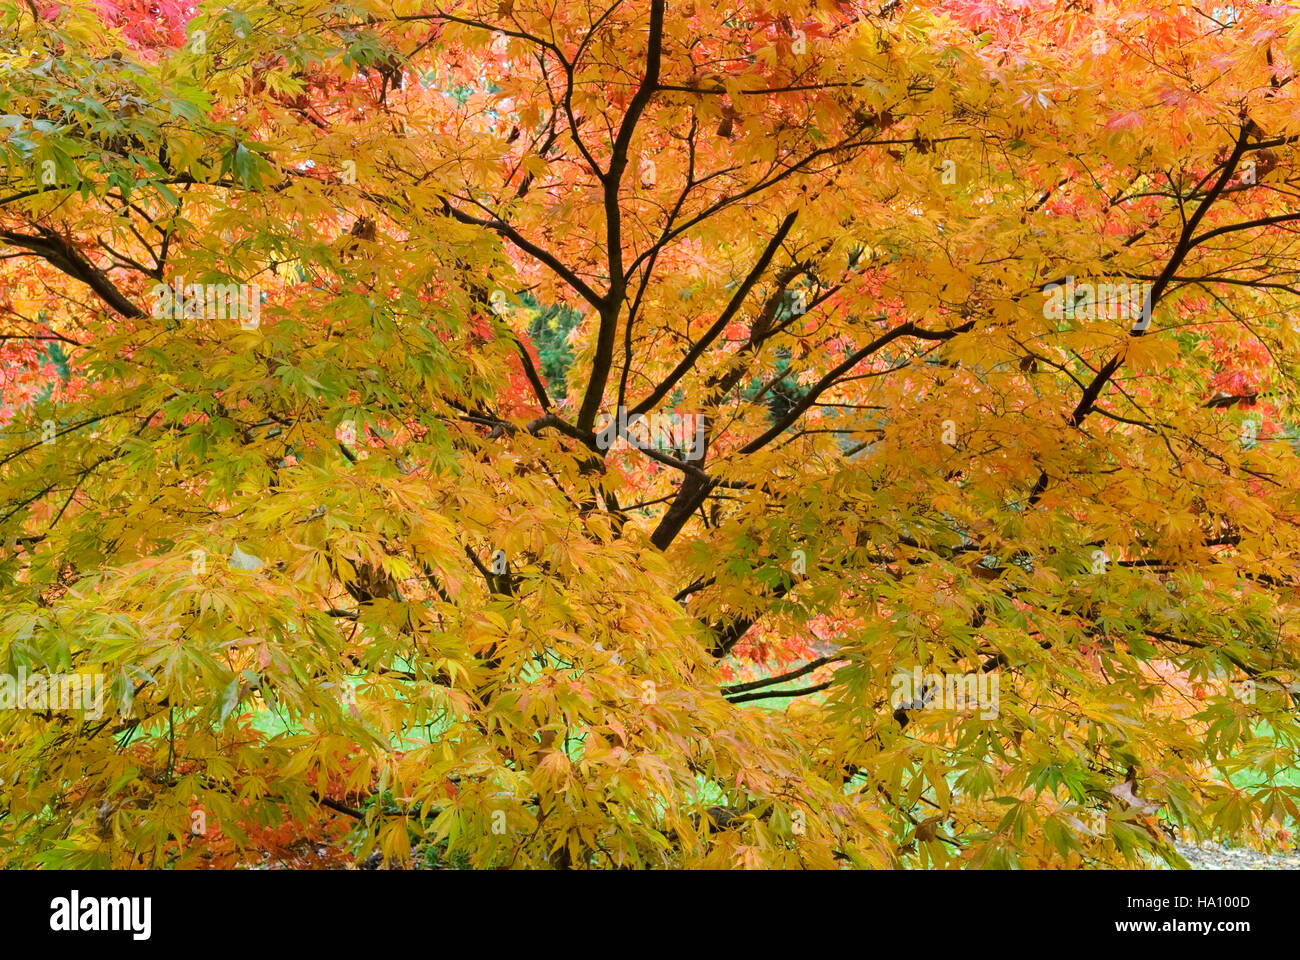 ACER PALMATUM HESSEI JAPANESE MAPLE AUTUMN FOLIAGE Stock Photo